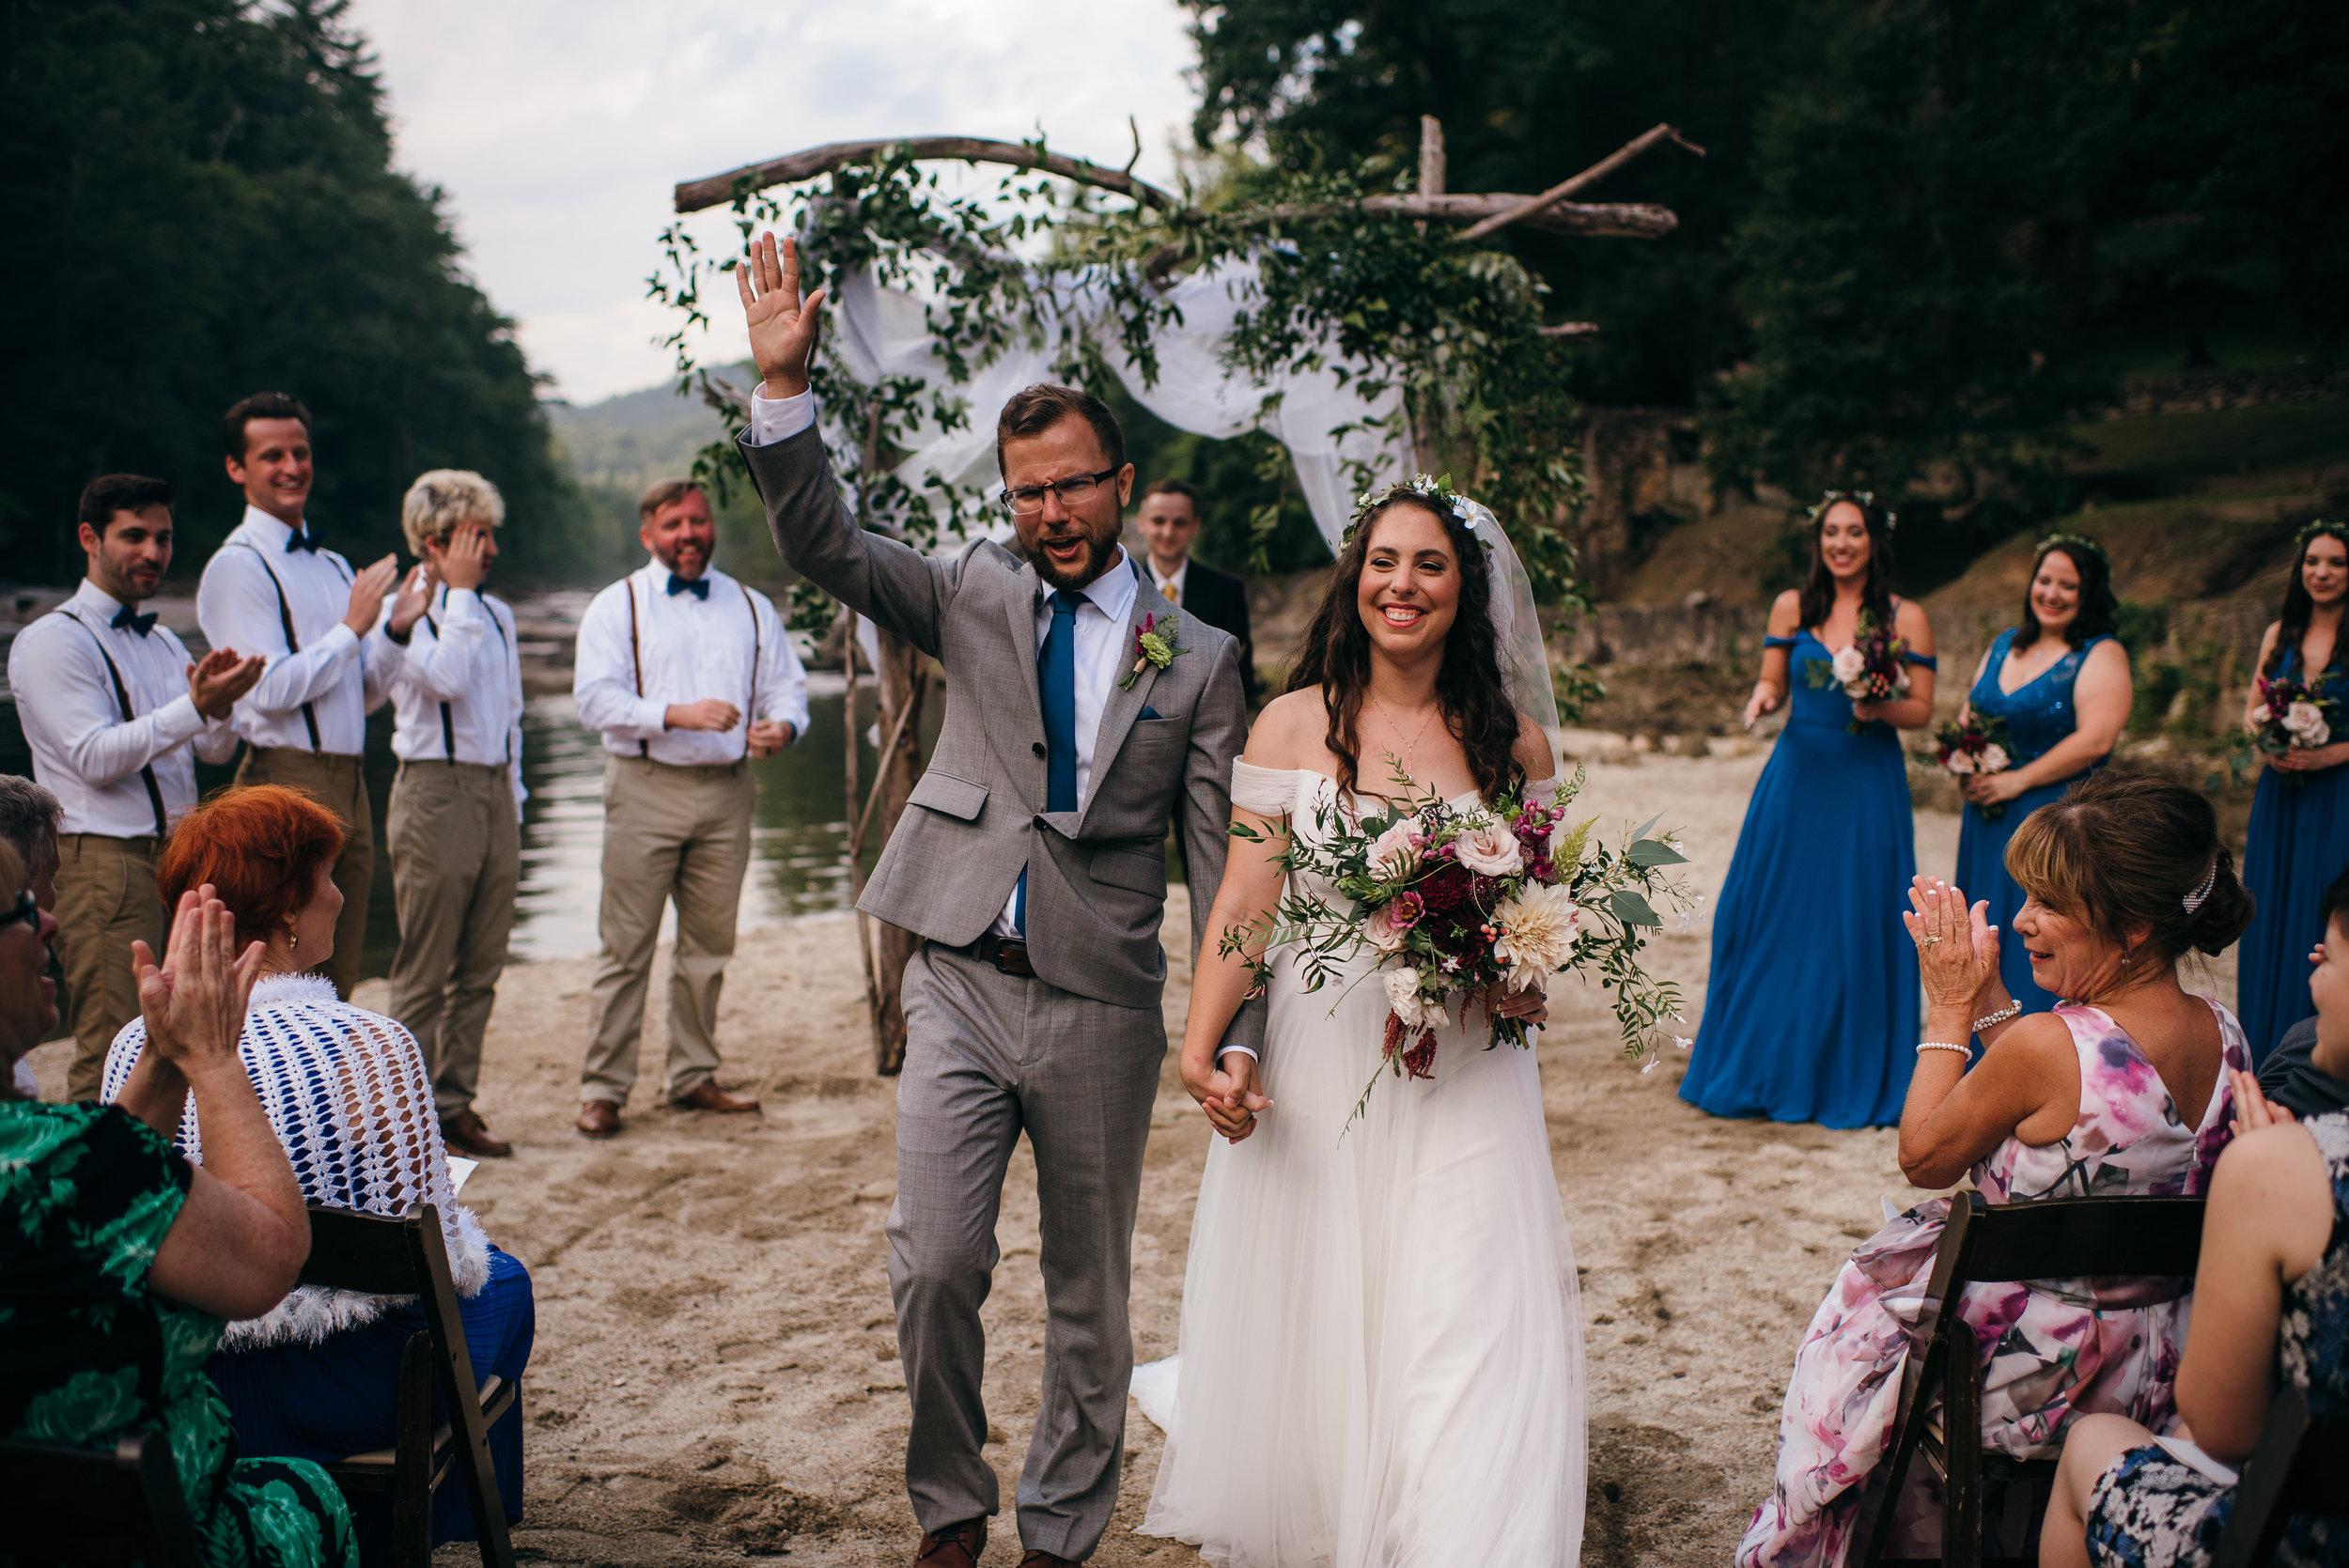 morris peaceland farm wedding - raleigh wedding photographer - north carolina wedding photographer - raleigh elopement photographer - north carolina elopement photographer